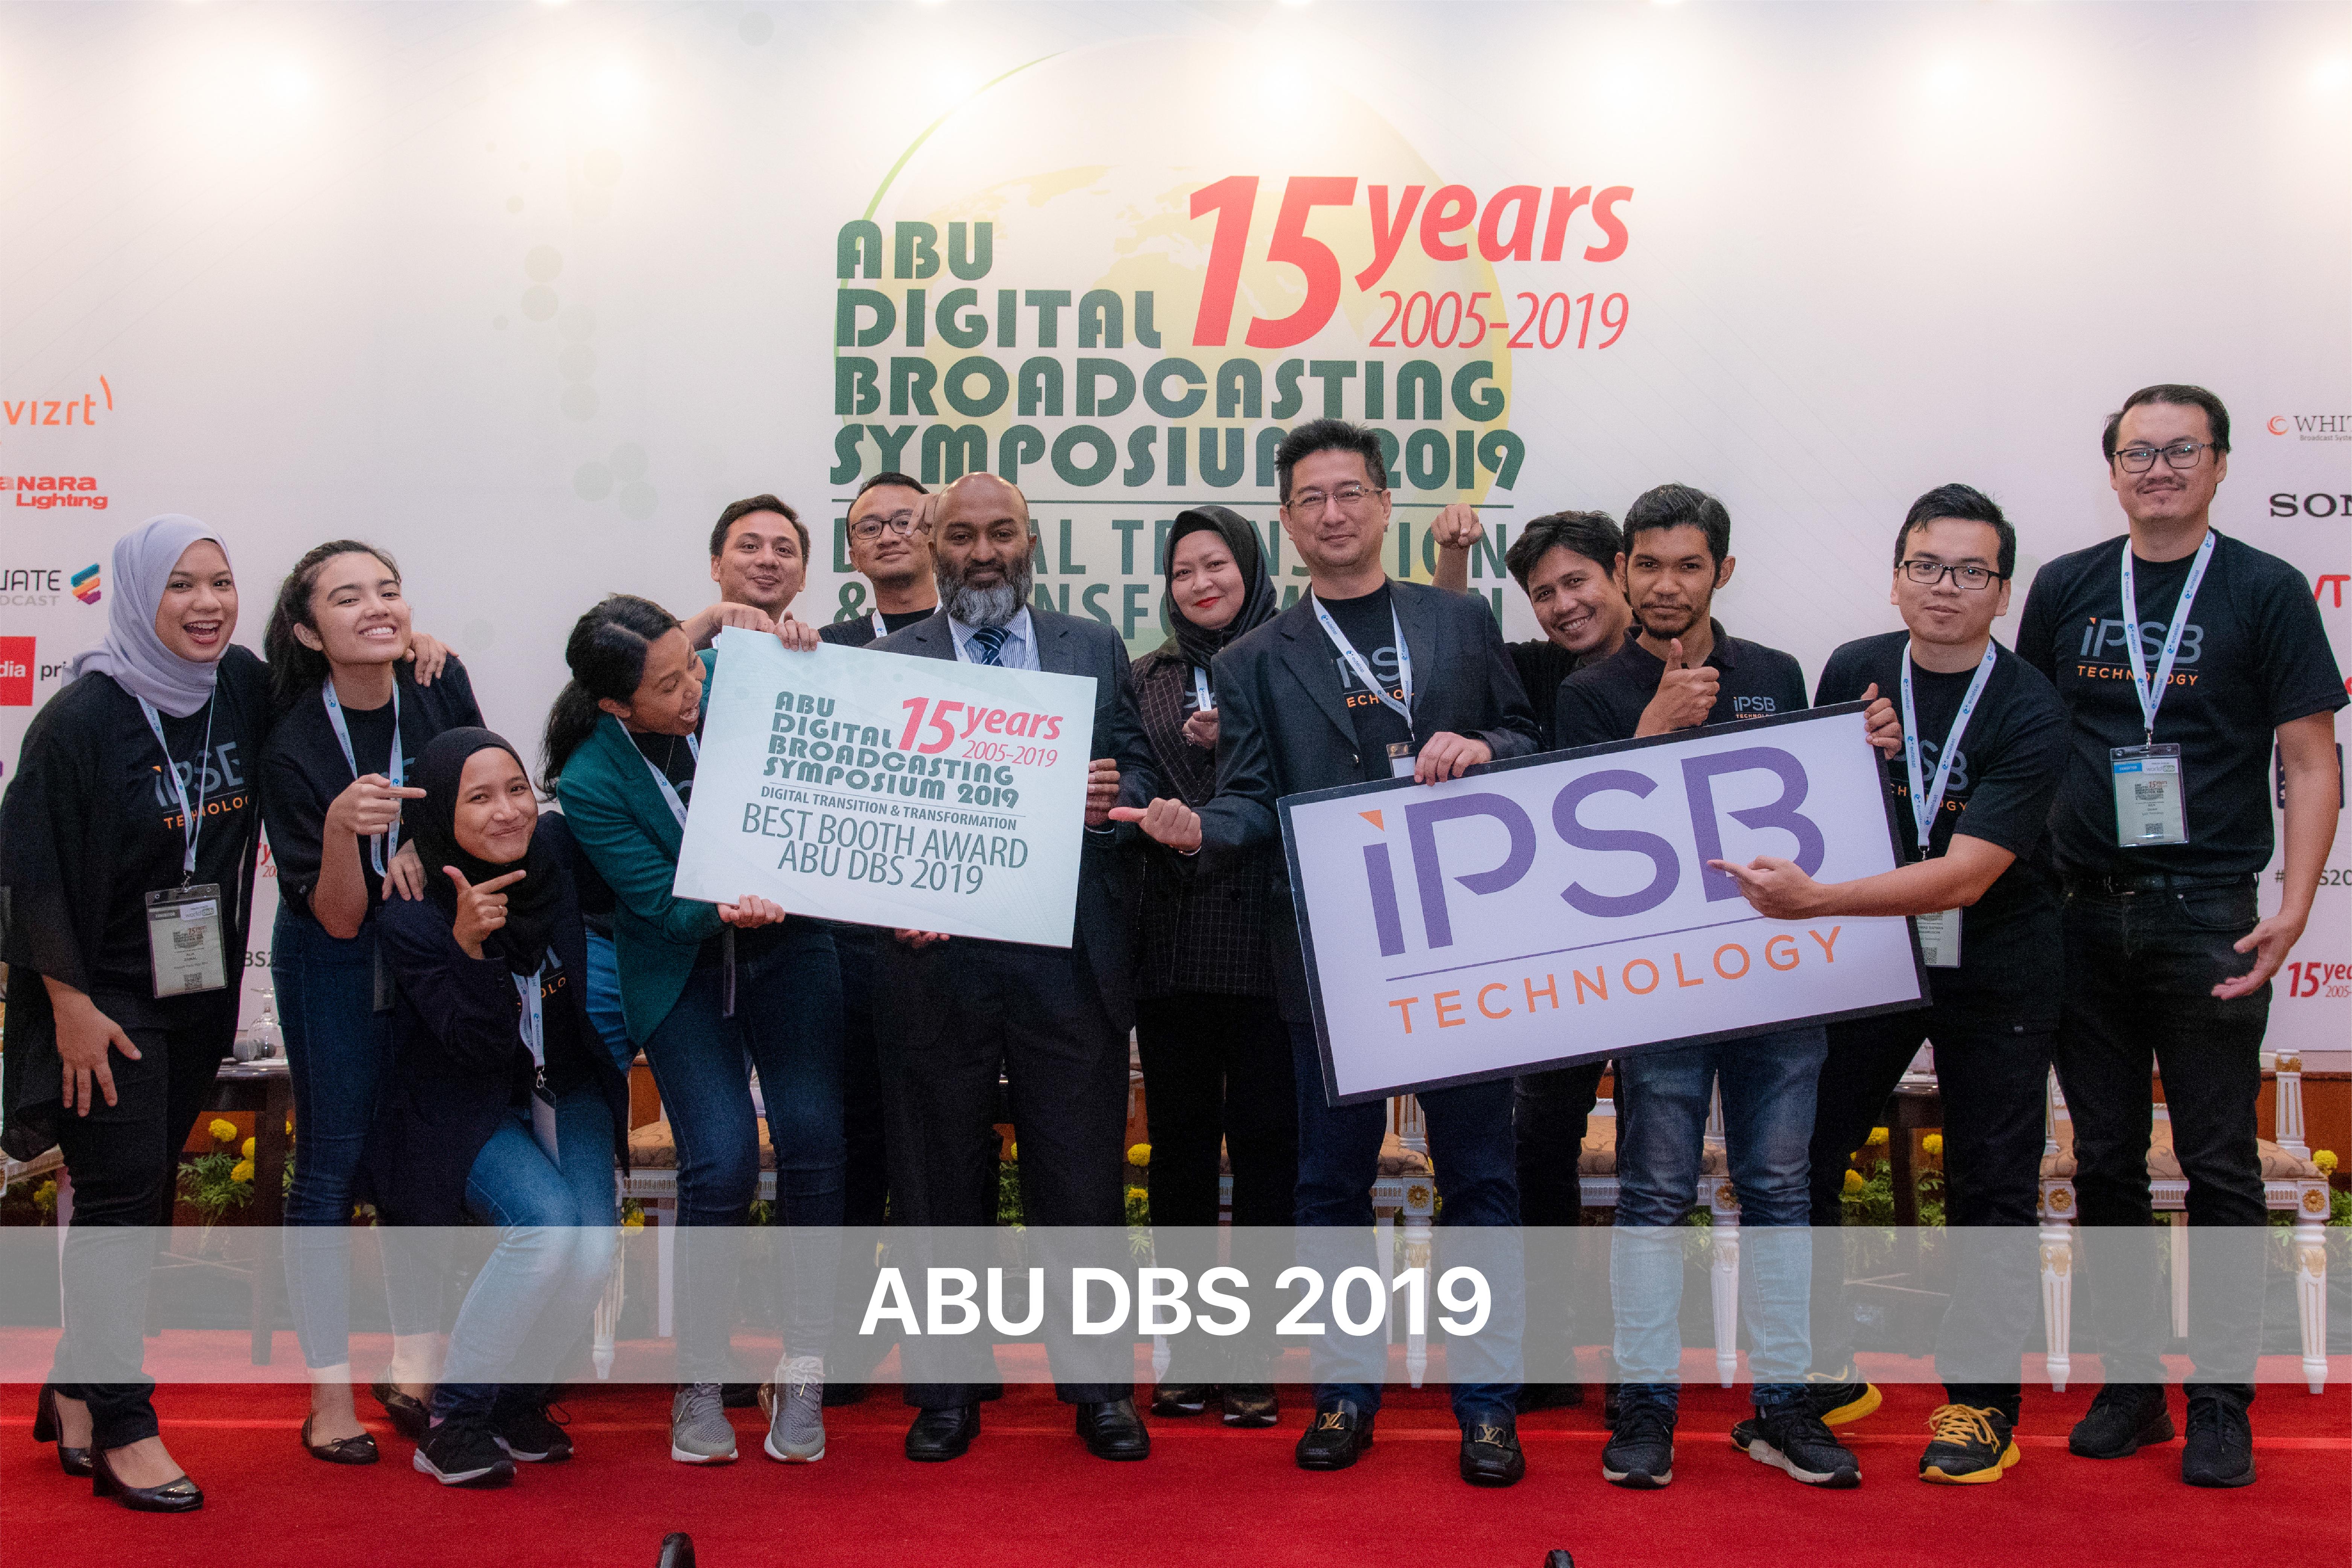 IPSB Technology ABUDBS2019